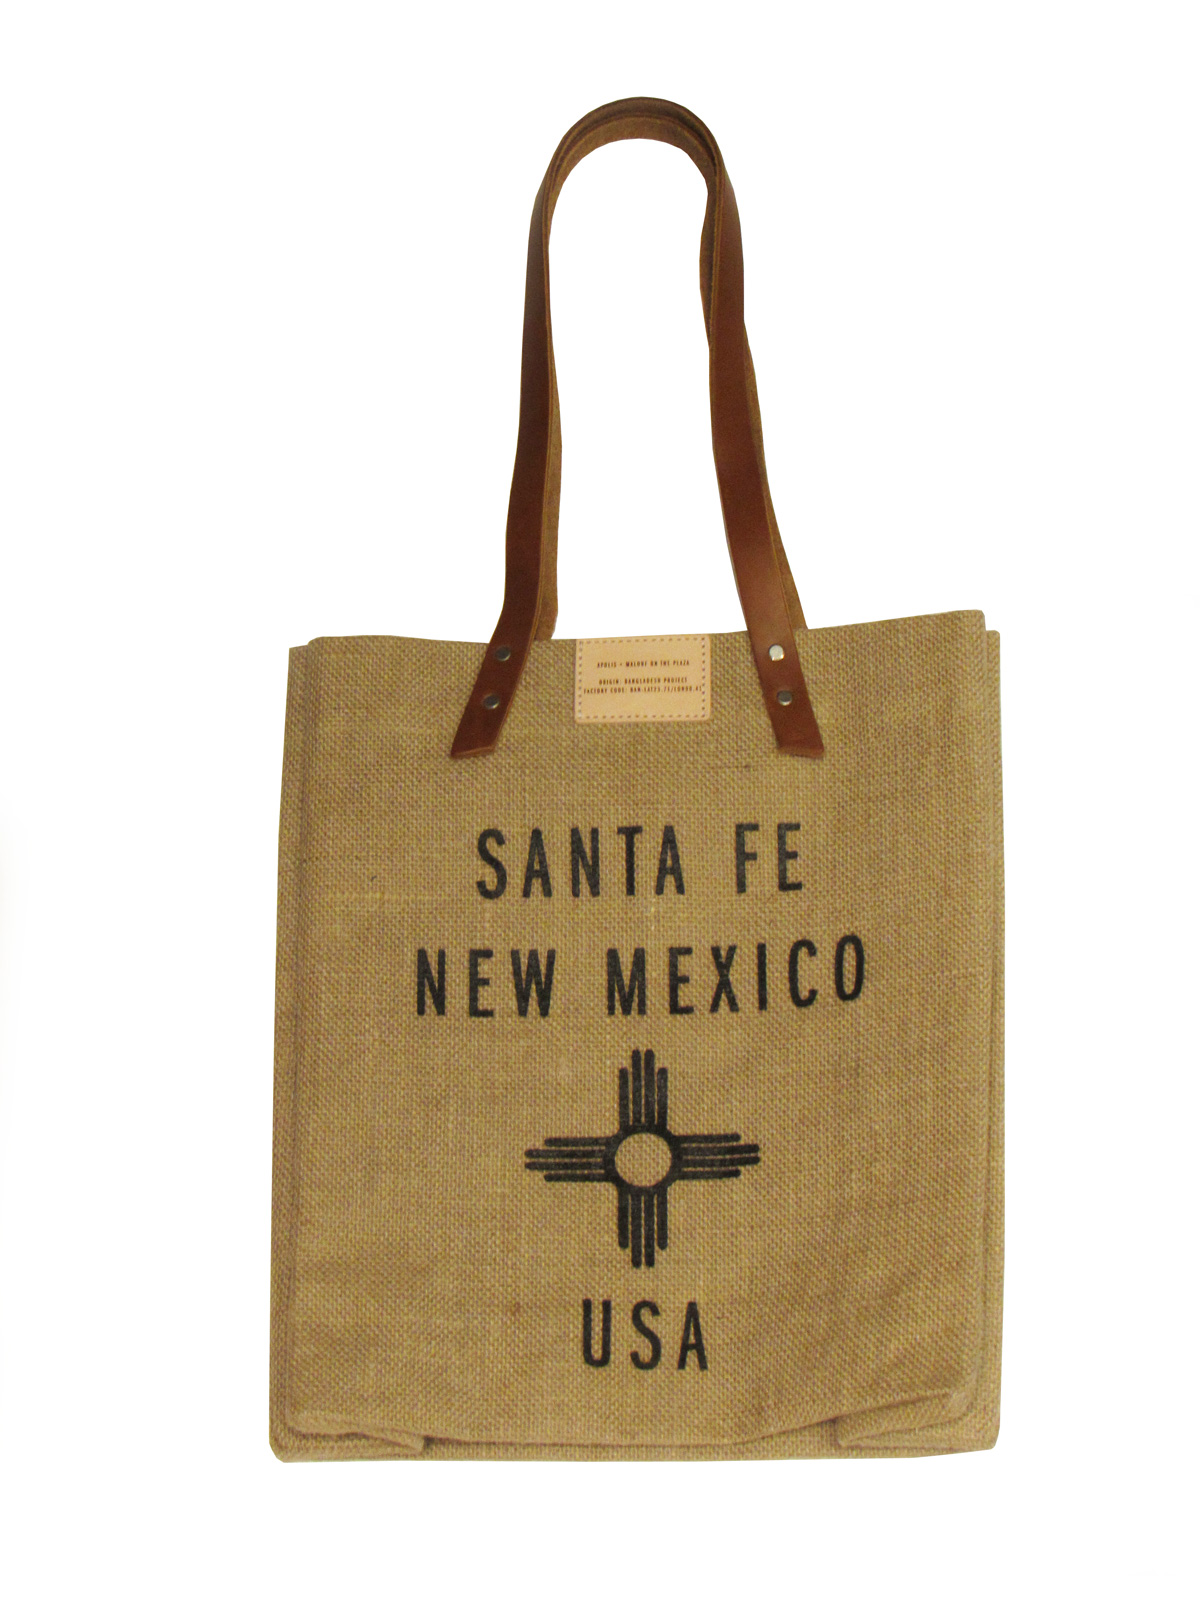 Santa Fe Market Bag long handles